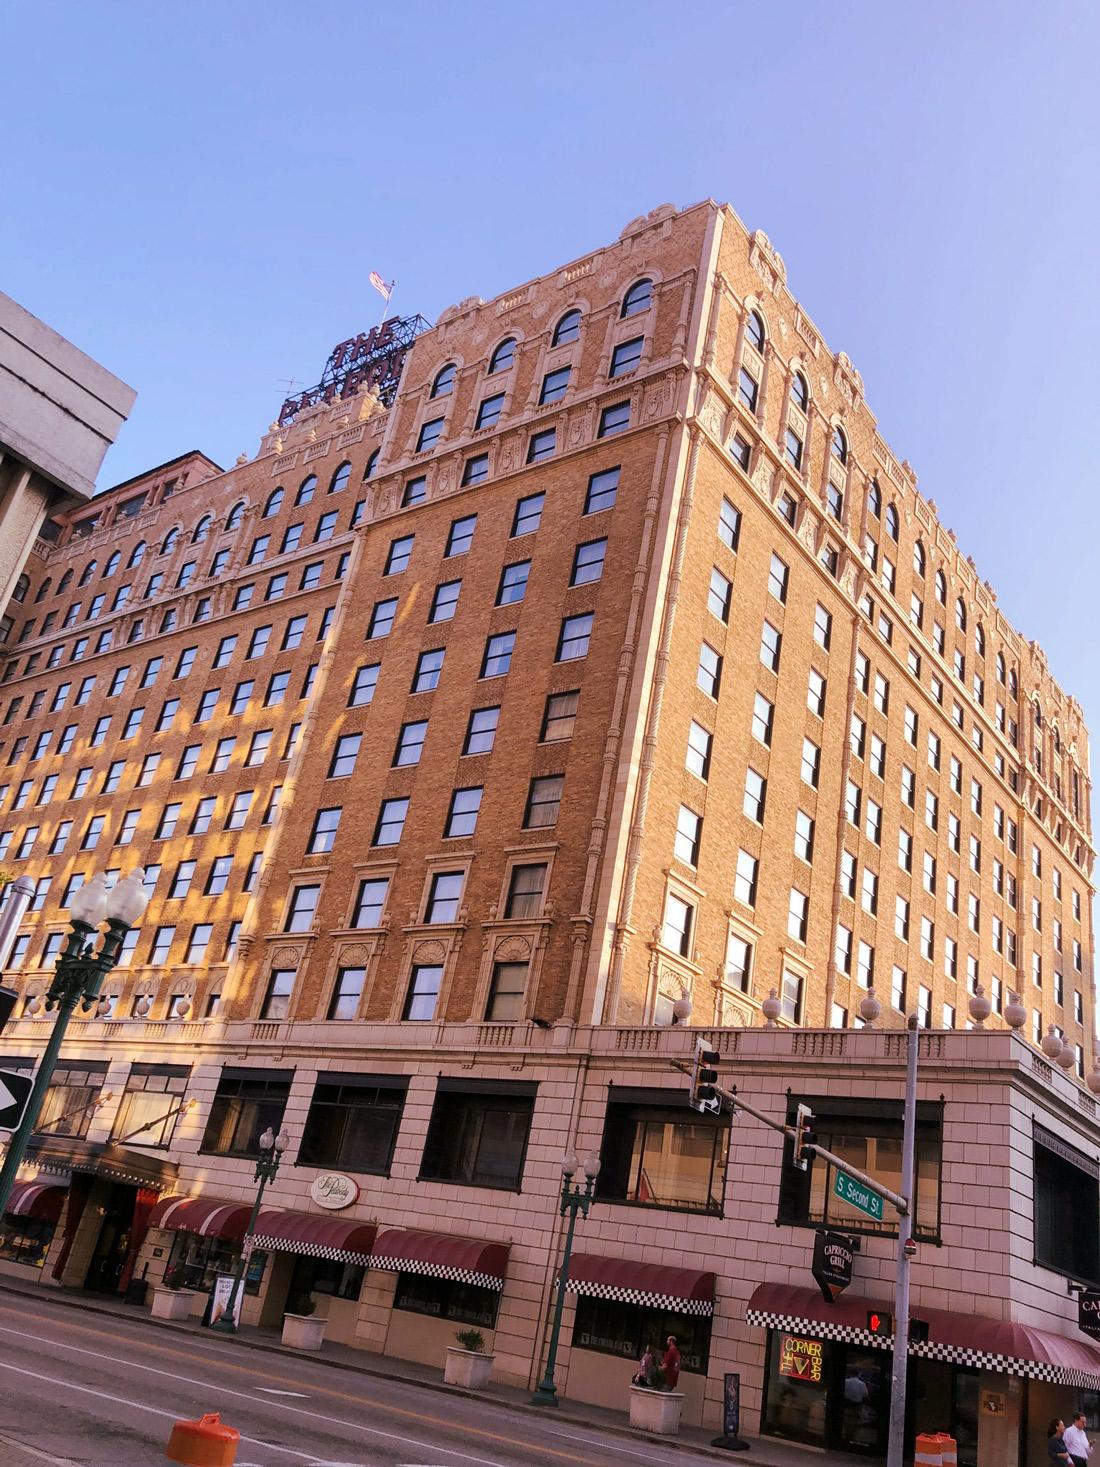 Bag-at-you---Travel-blog---The-Peabody-Memphis